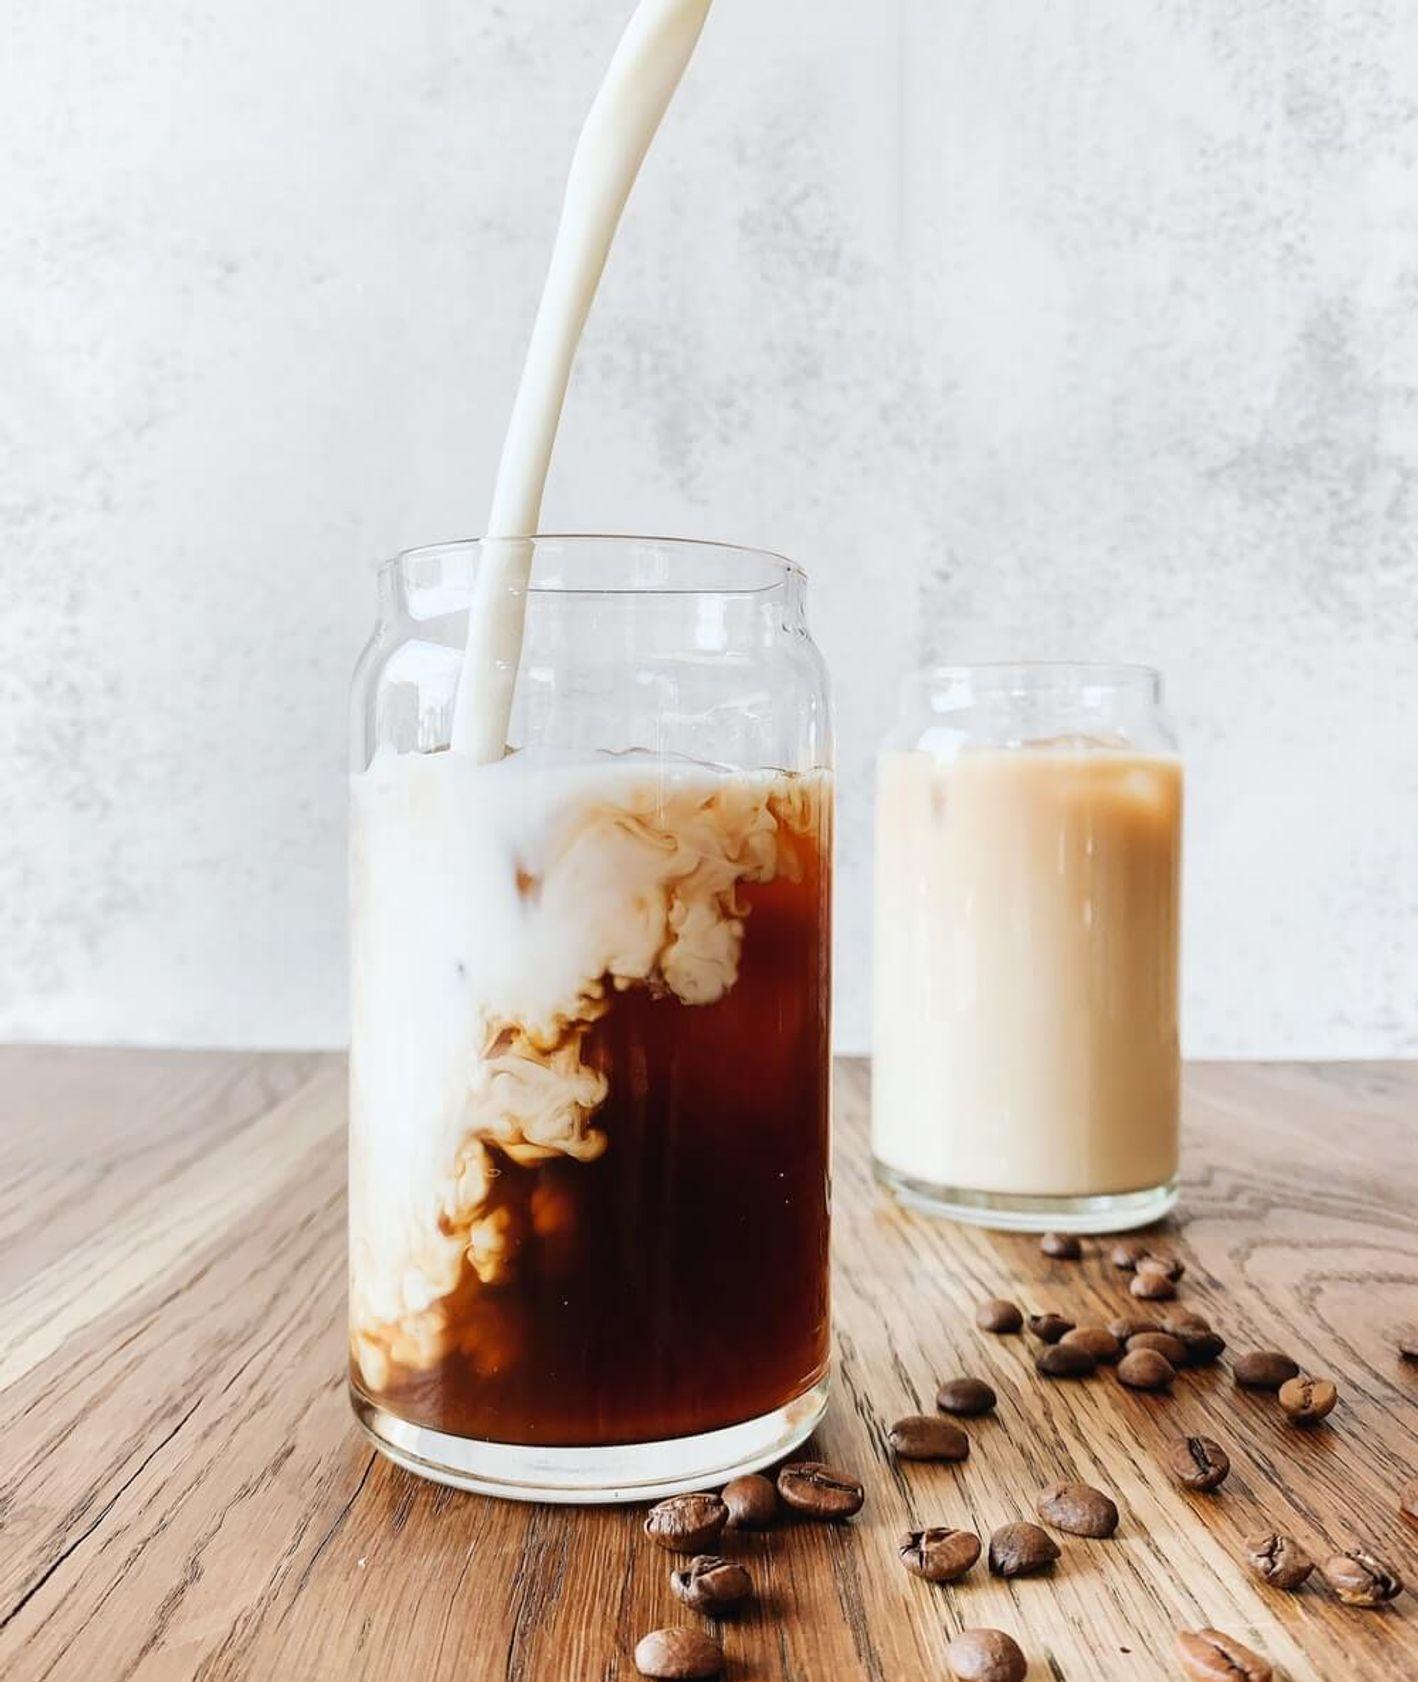 Mleko wlewane do kawy / Irene Kredenets / unsplash.com